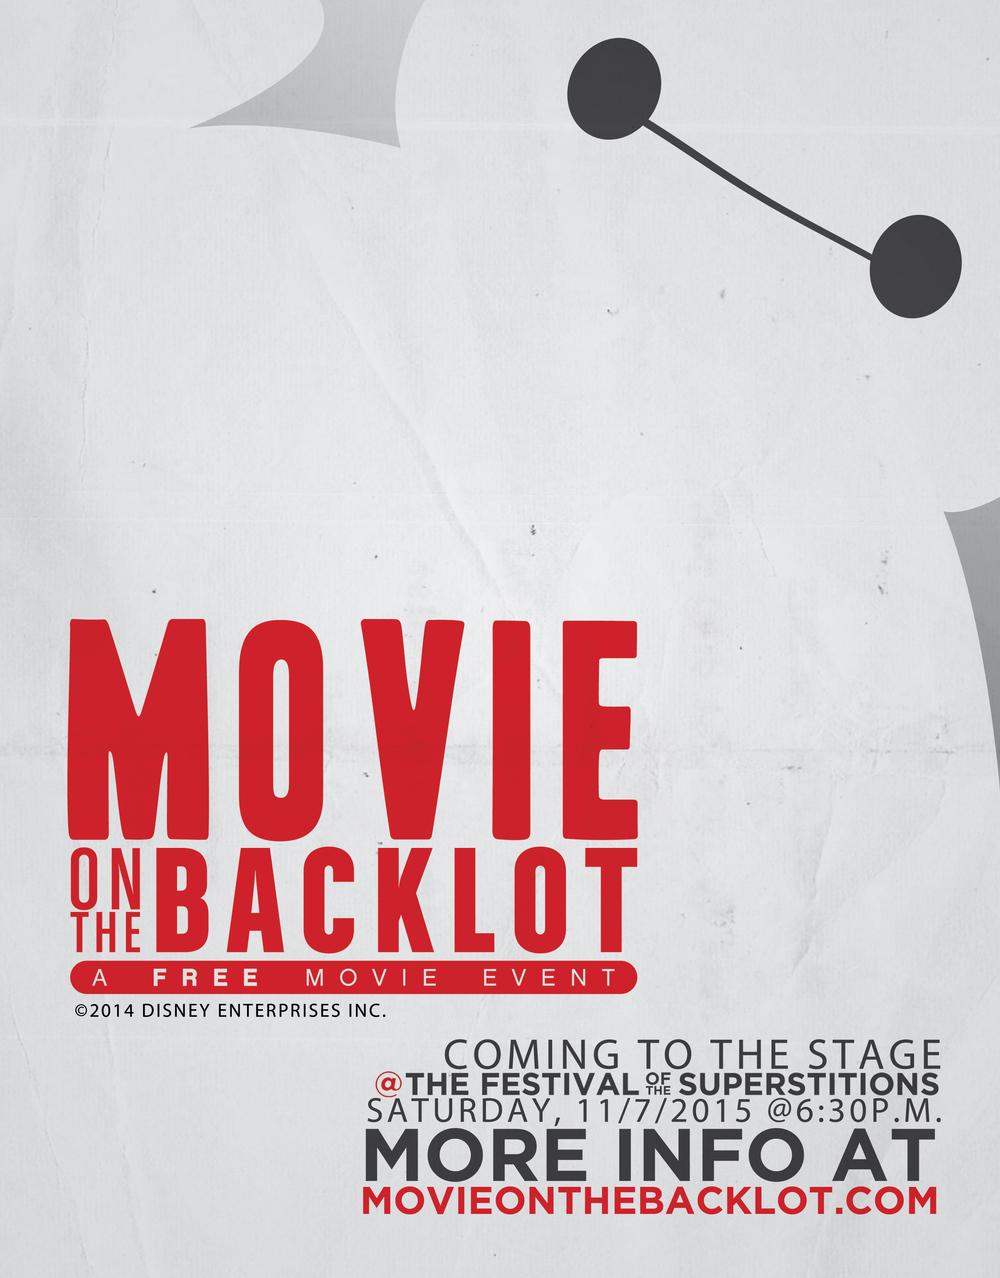 Movie On The Backlot 2015 Big Hero 6